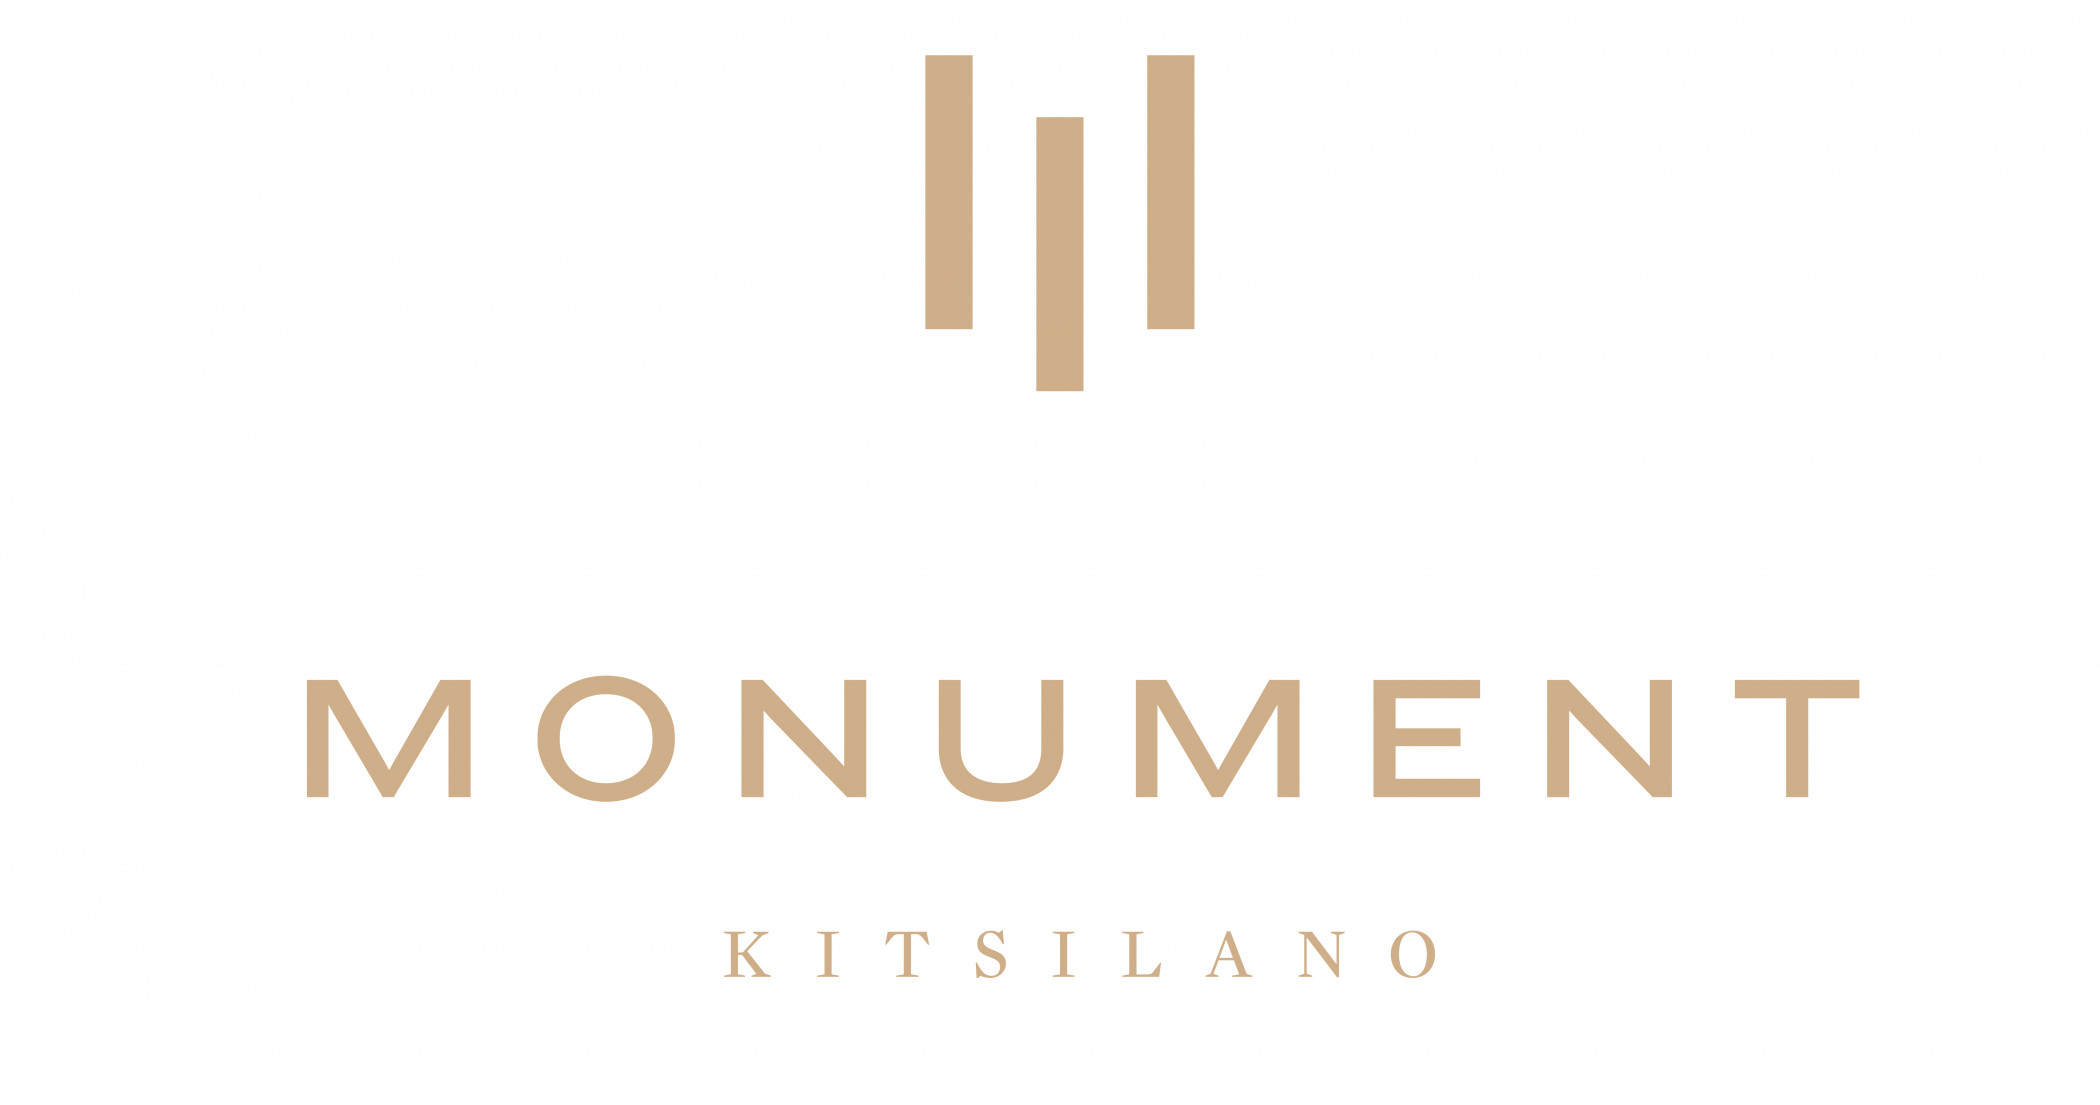 Monument Kitsilano – Prices, Availability, Plans